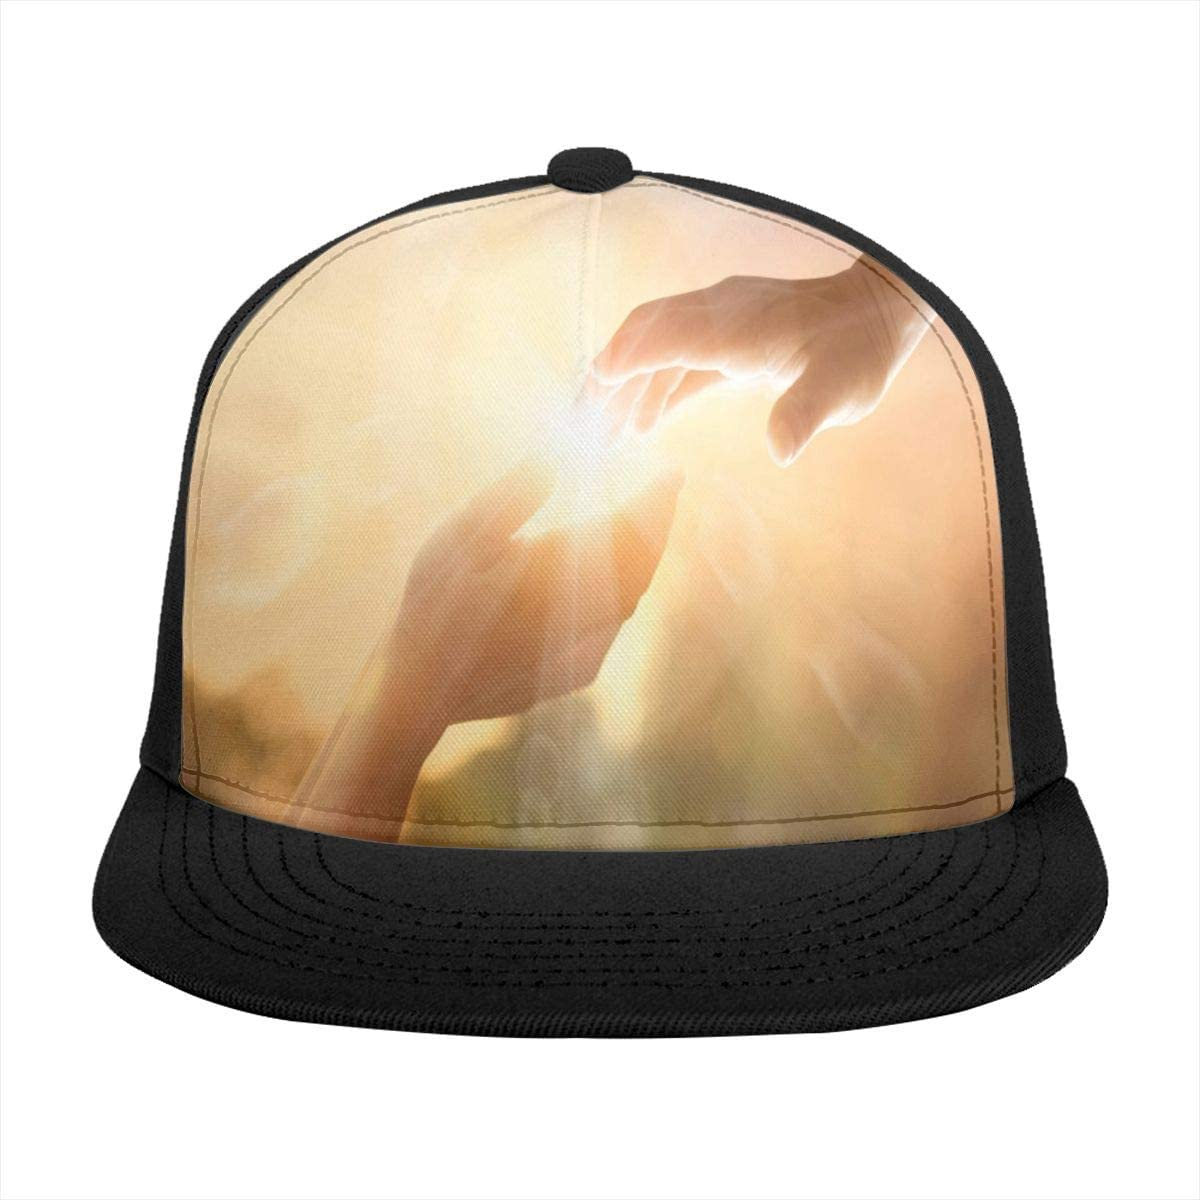 Baseball Cap God's Helping Hand with Sunset Sun Trucker Hats for Women Men Girls Boys Summer